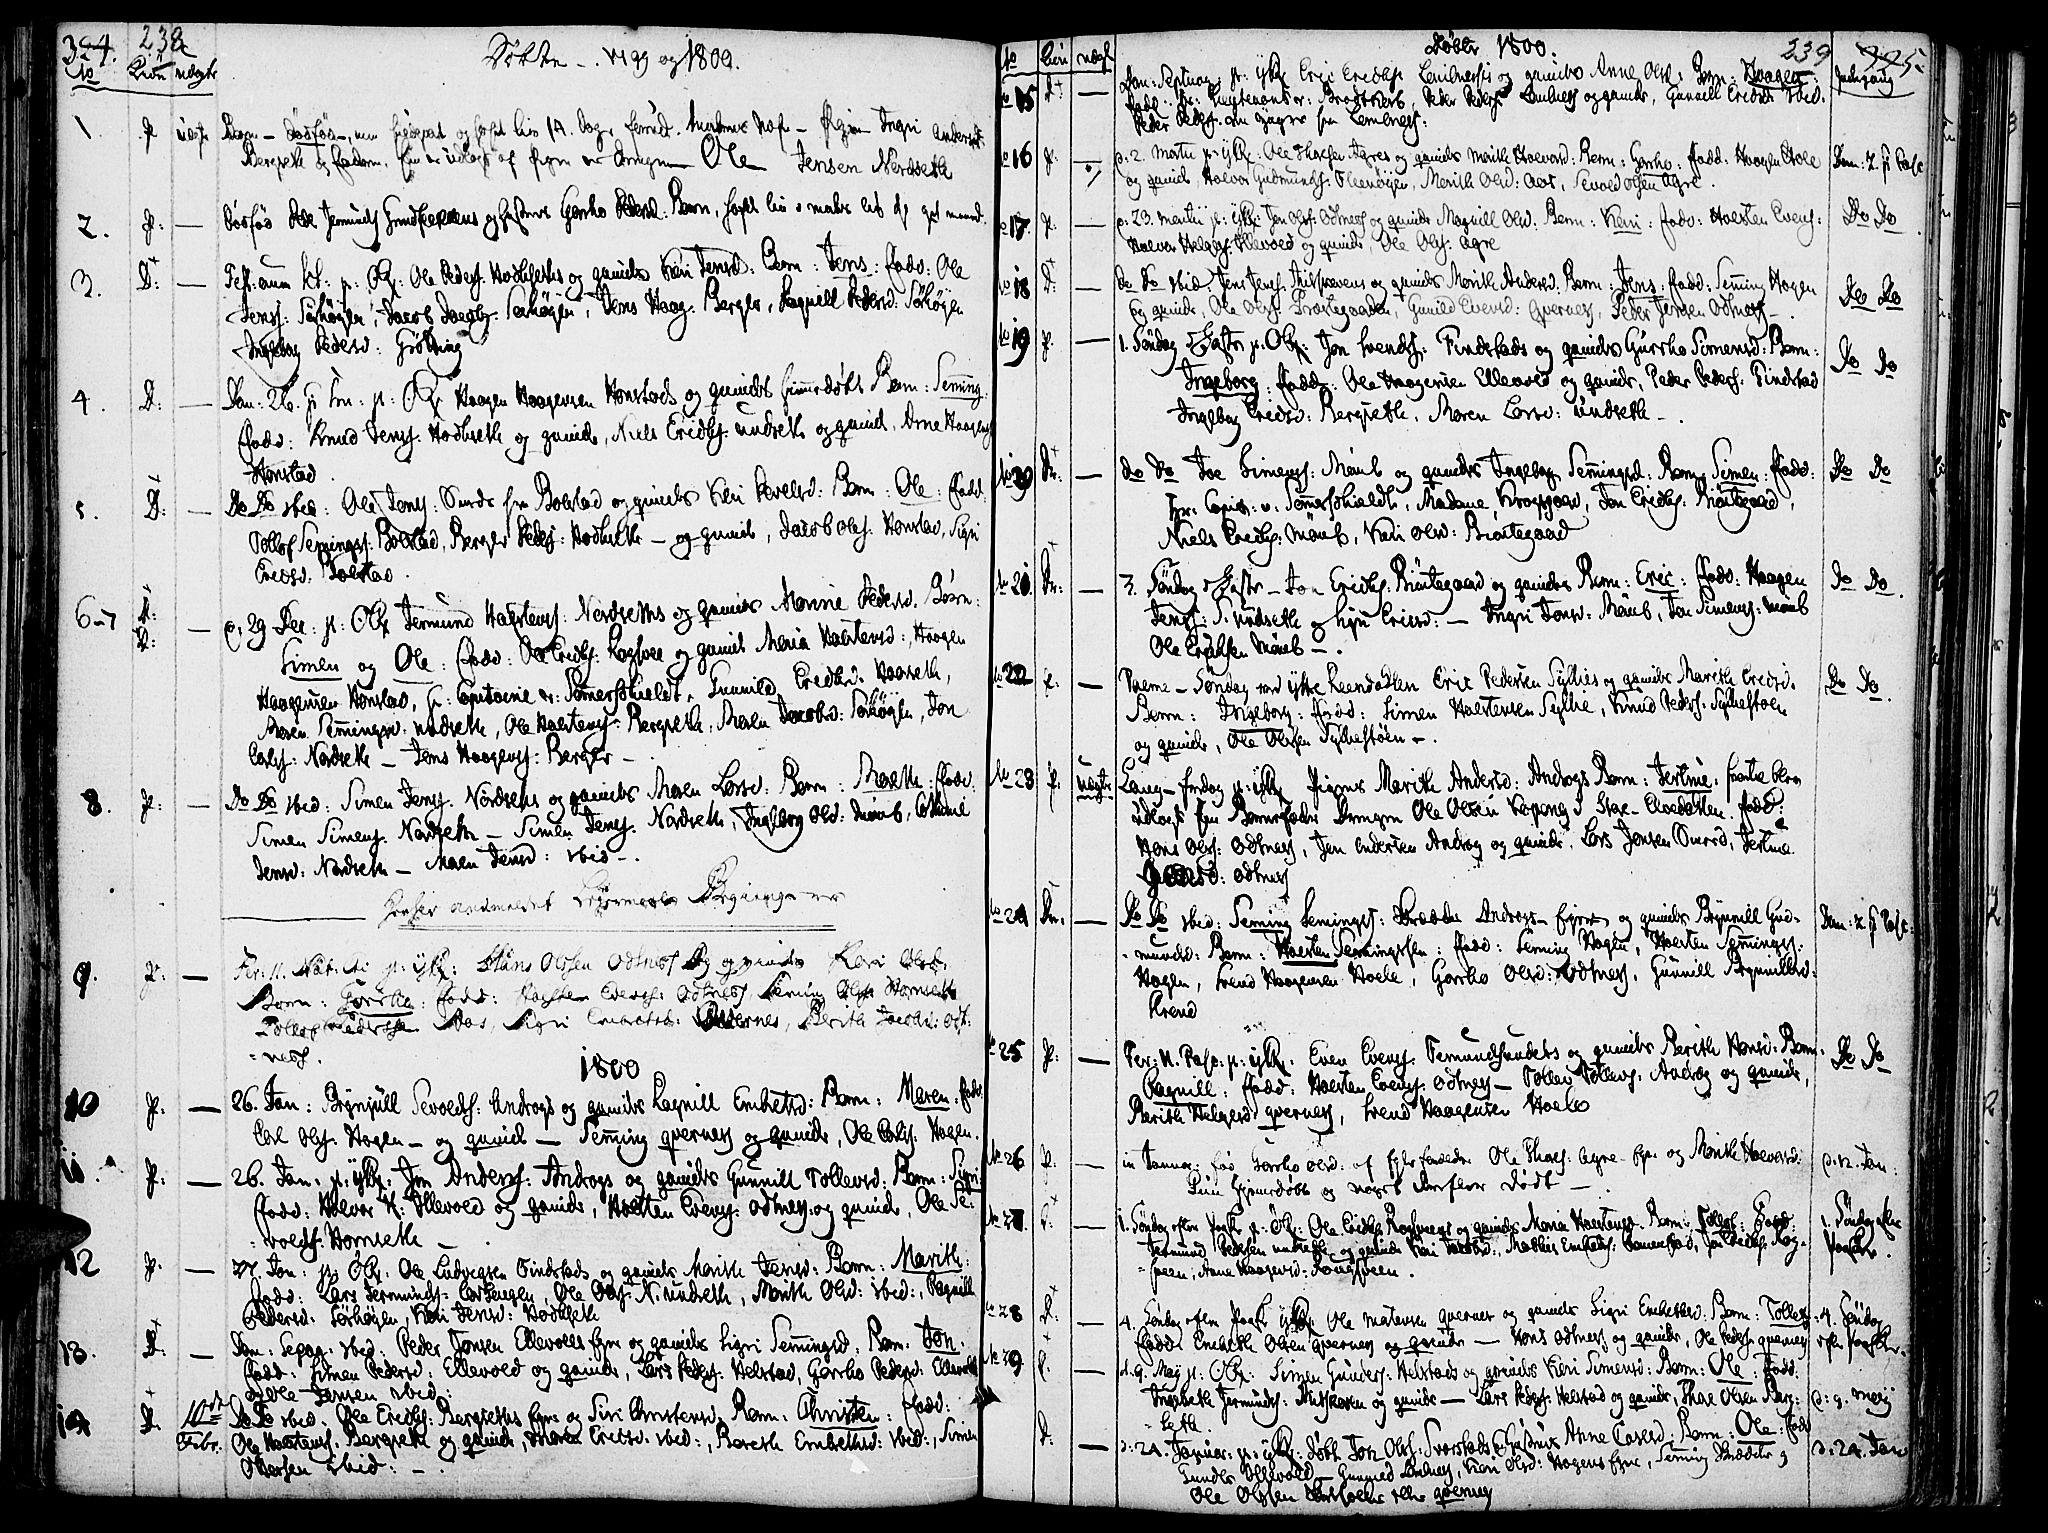 SAH, Rendalen prestekontor, H/Ha/Haa/L0002: Ministerialbok nr. 2, 1788-1814, s. 238-239